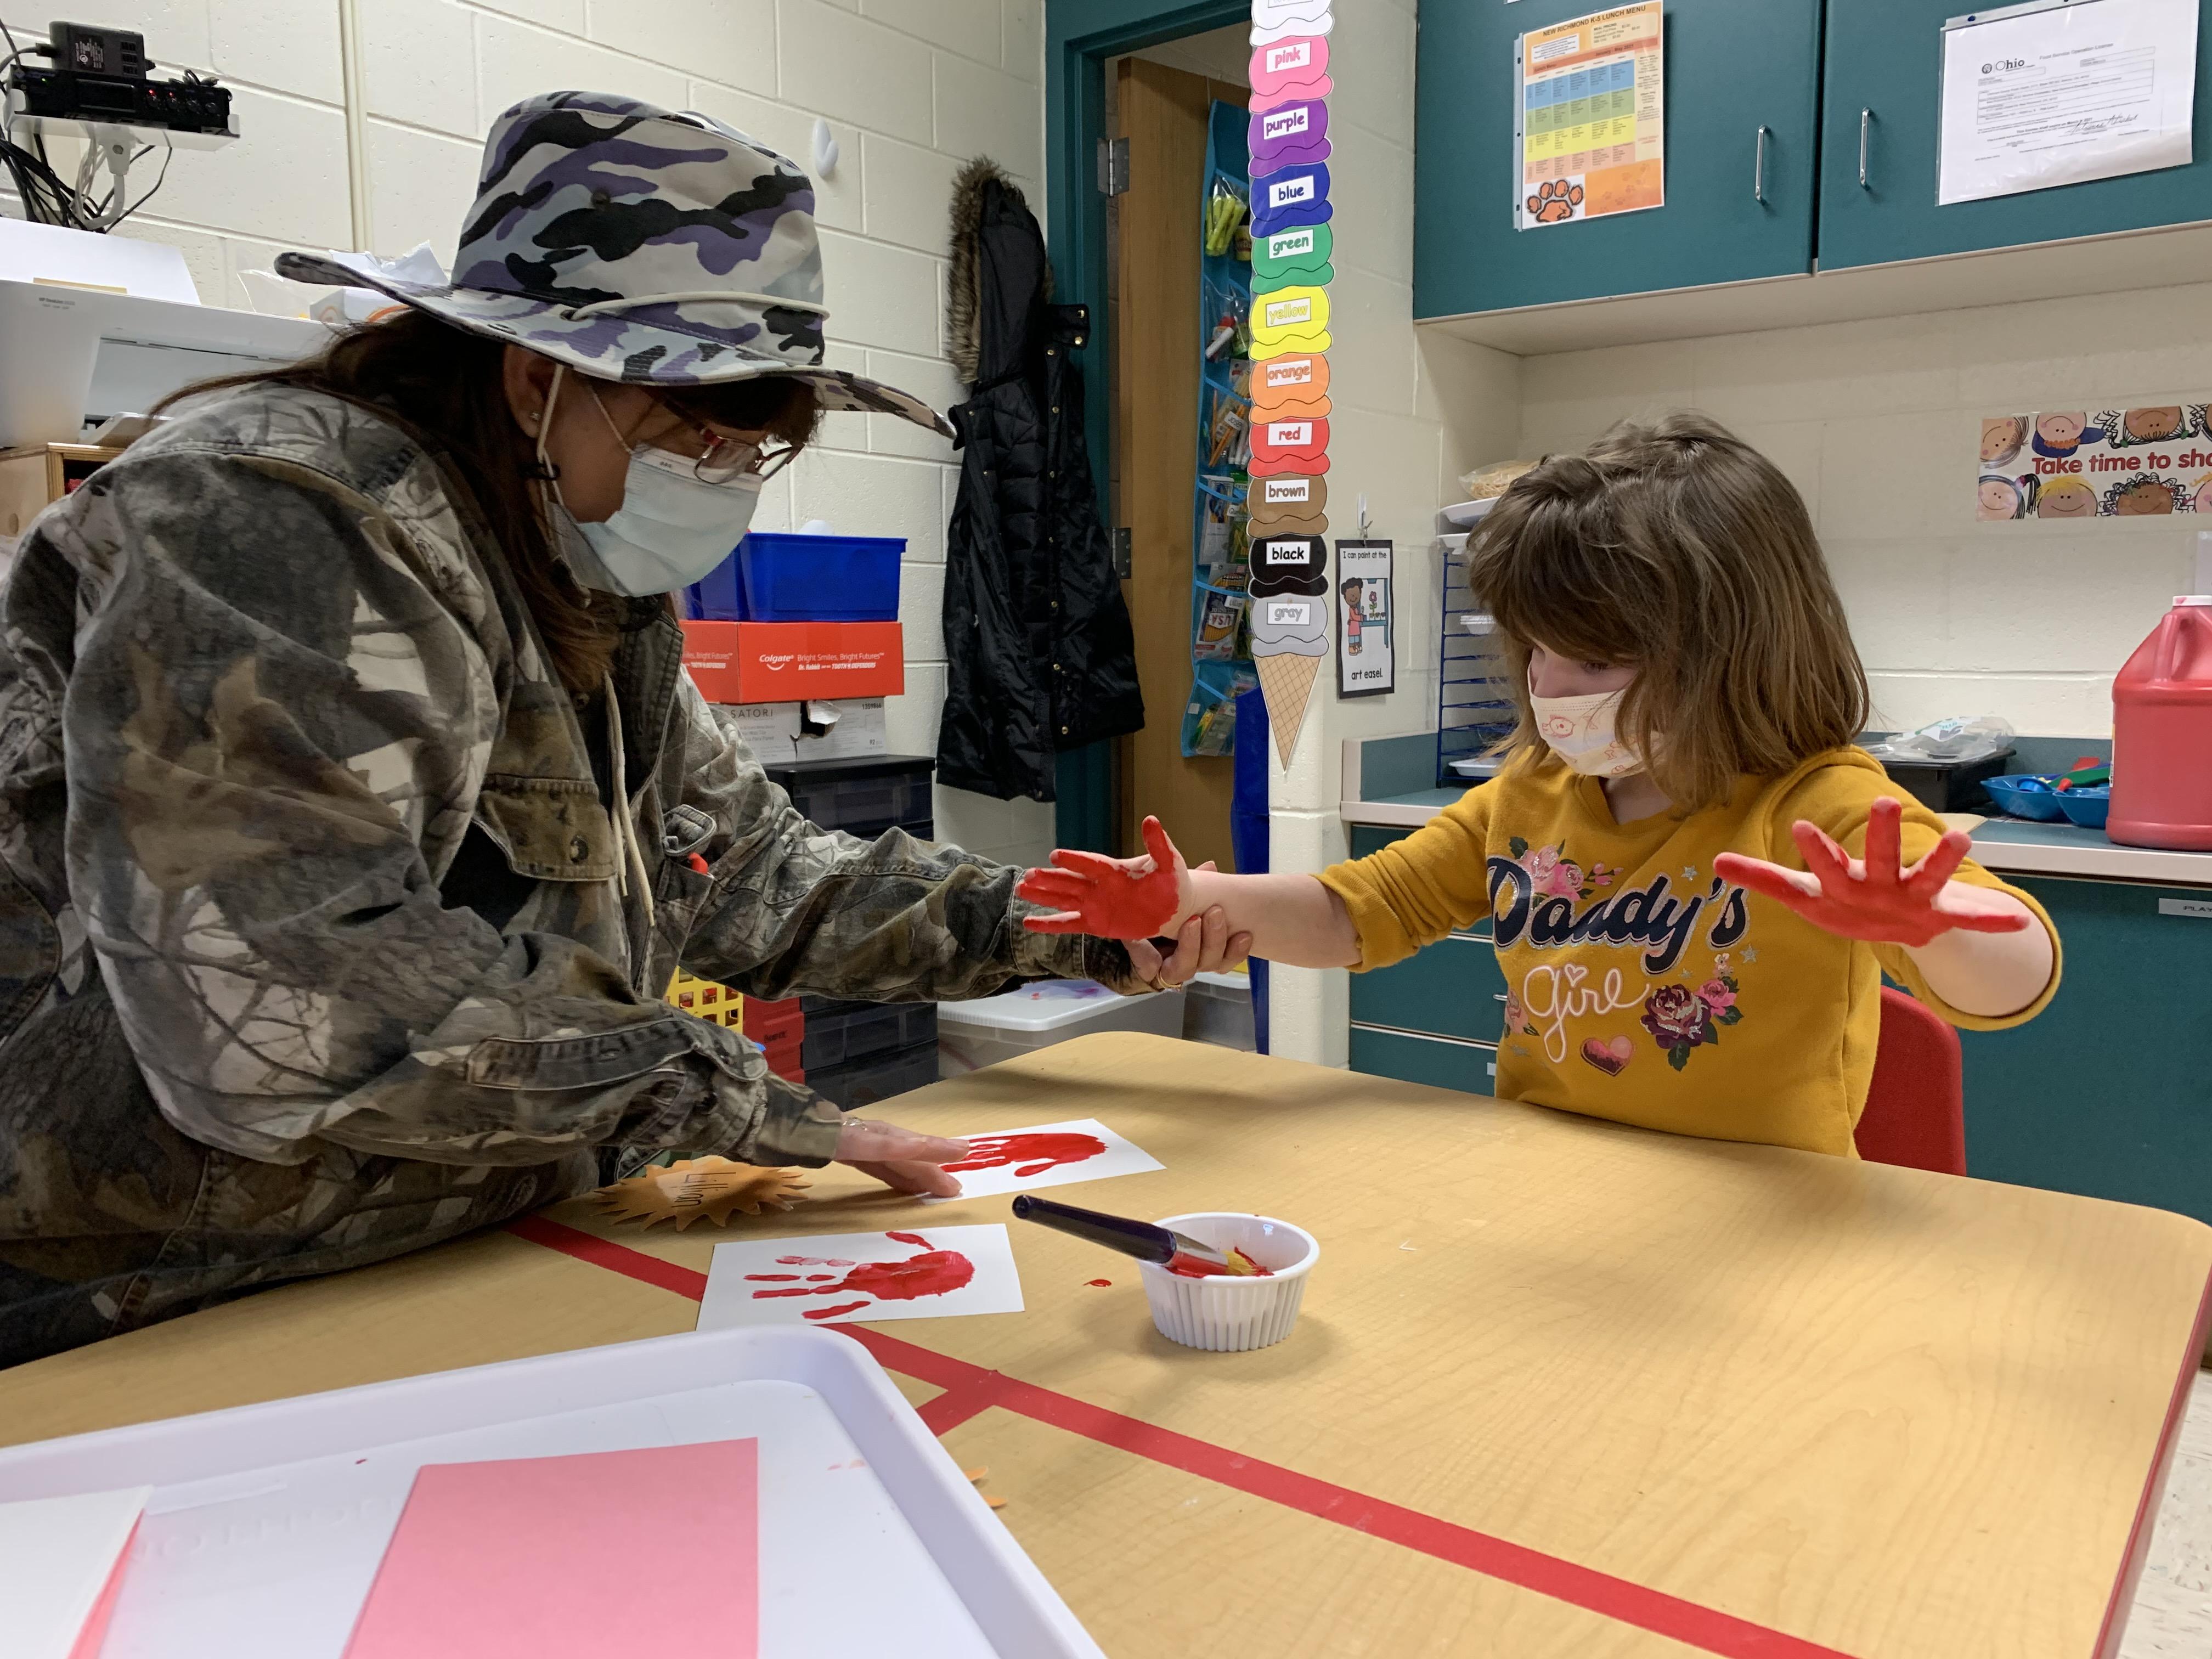 Teacher helps student make handprints with paint